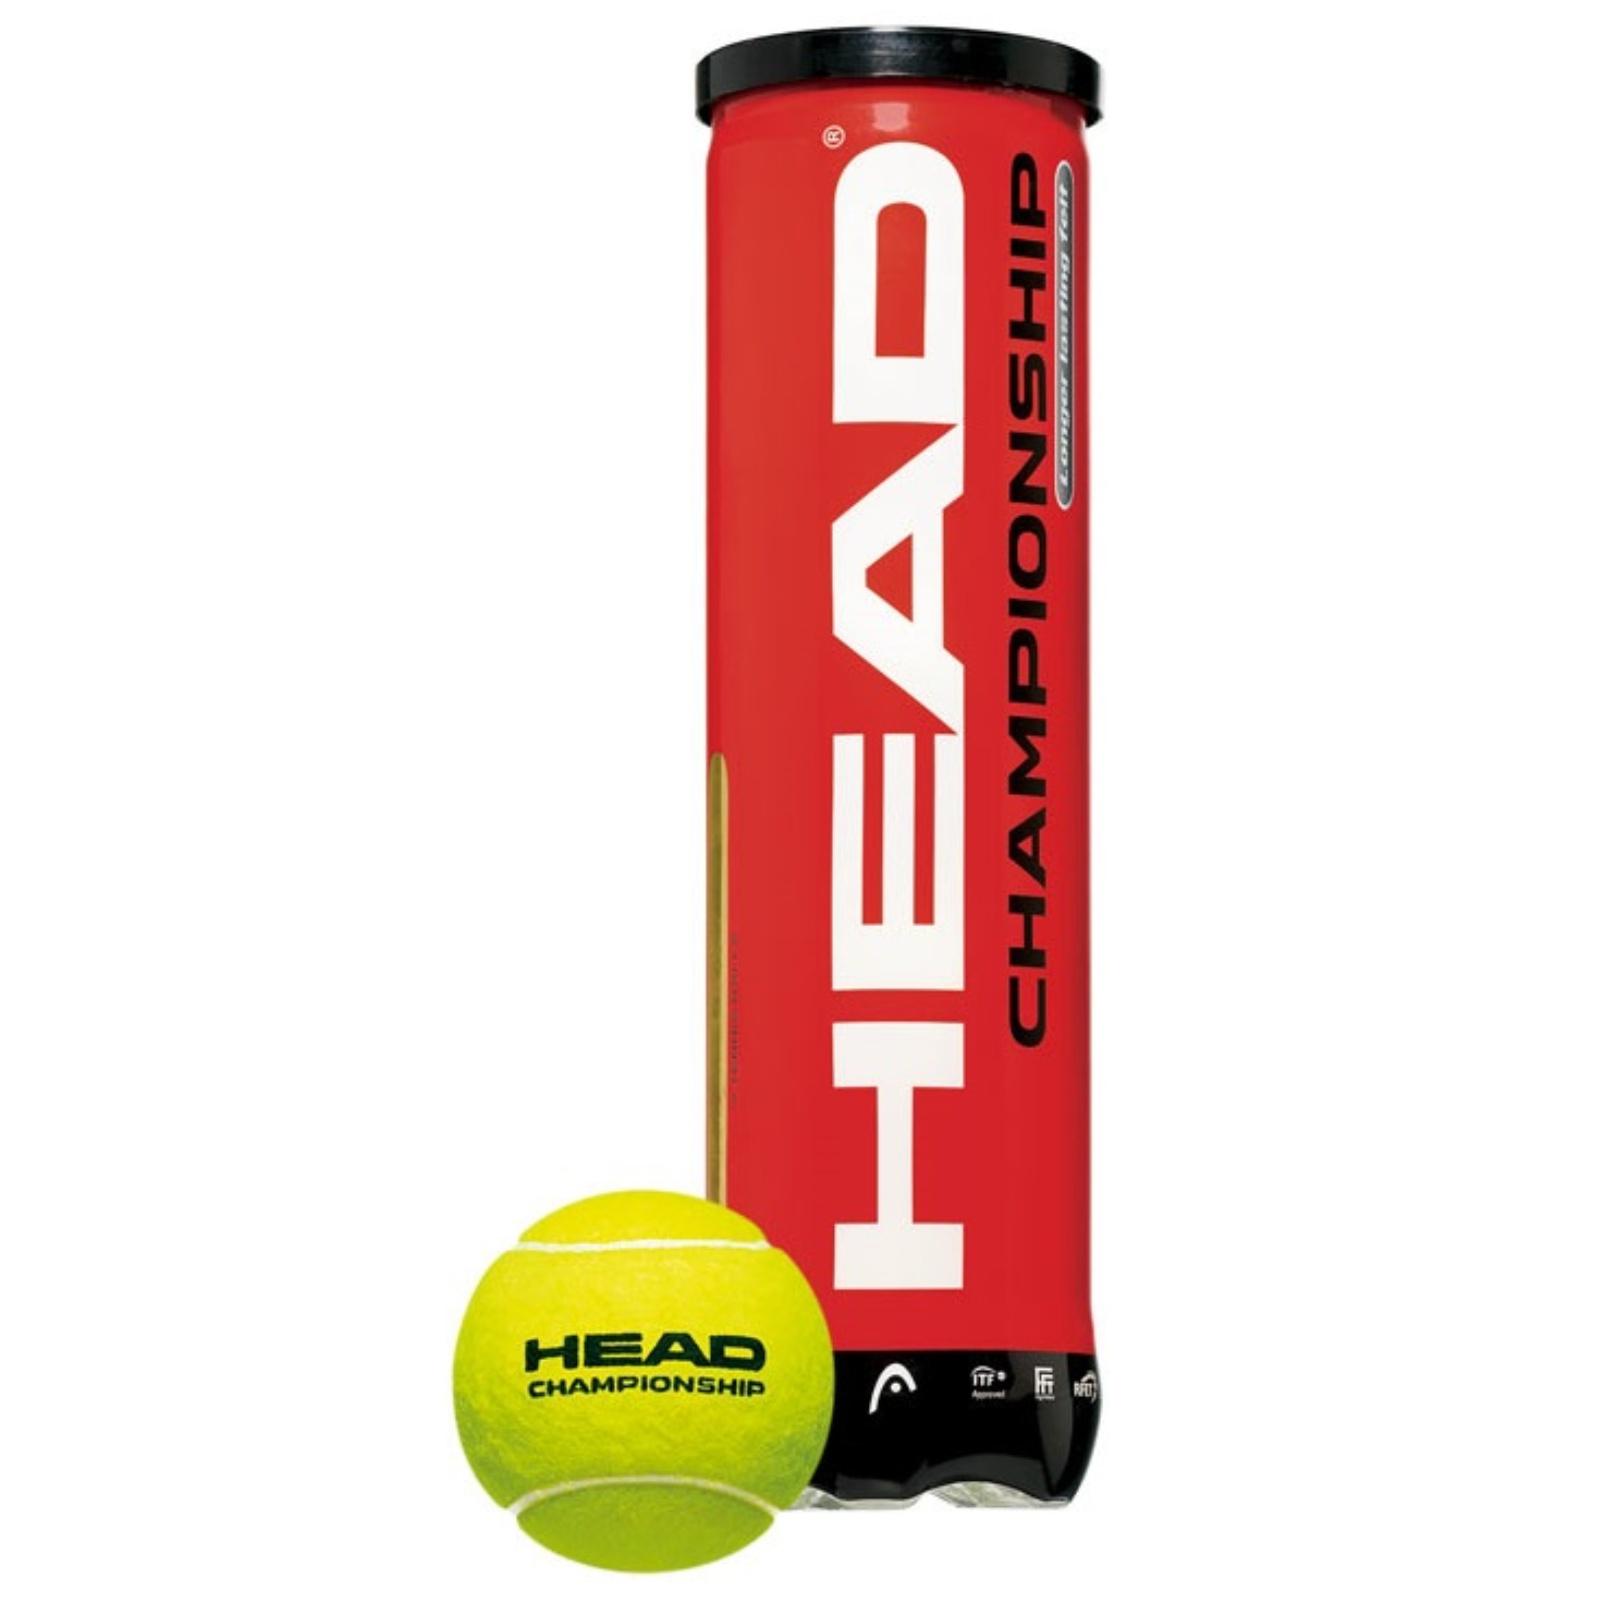 Tenisové míčky HEAD Championship 3 ks